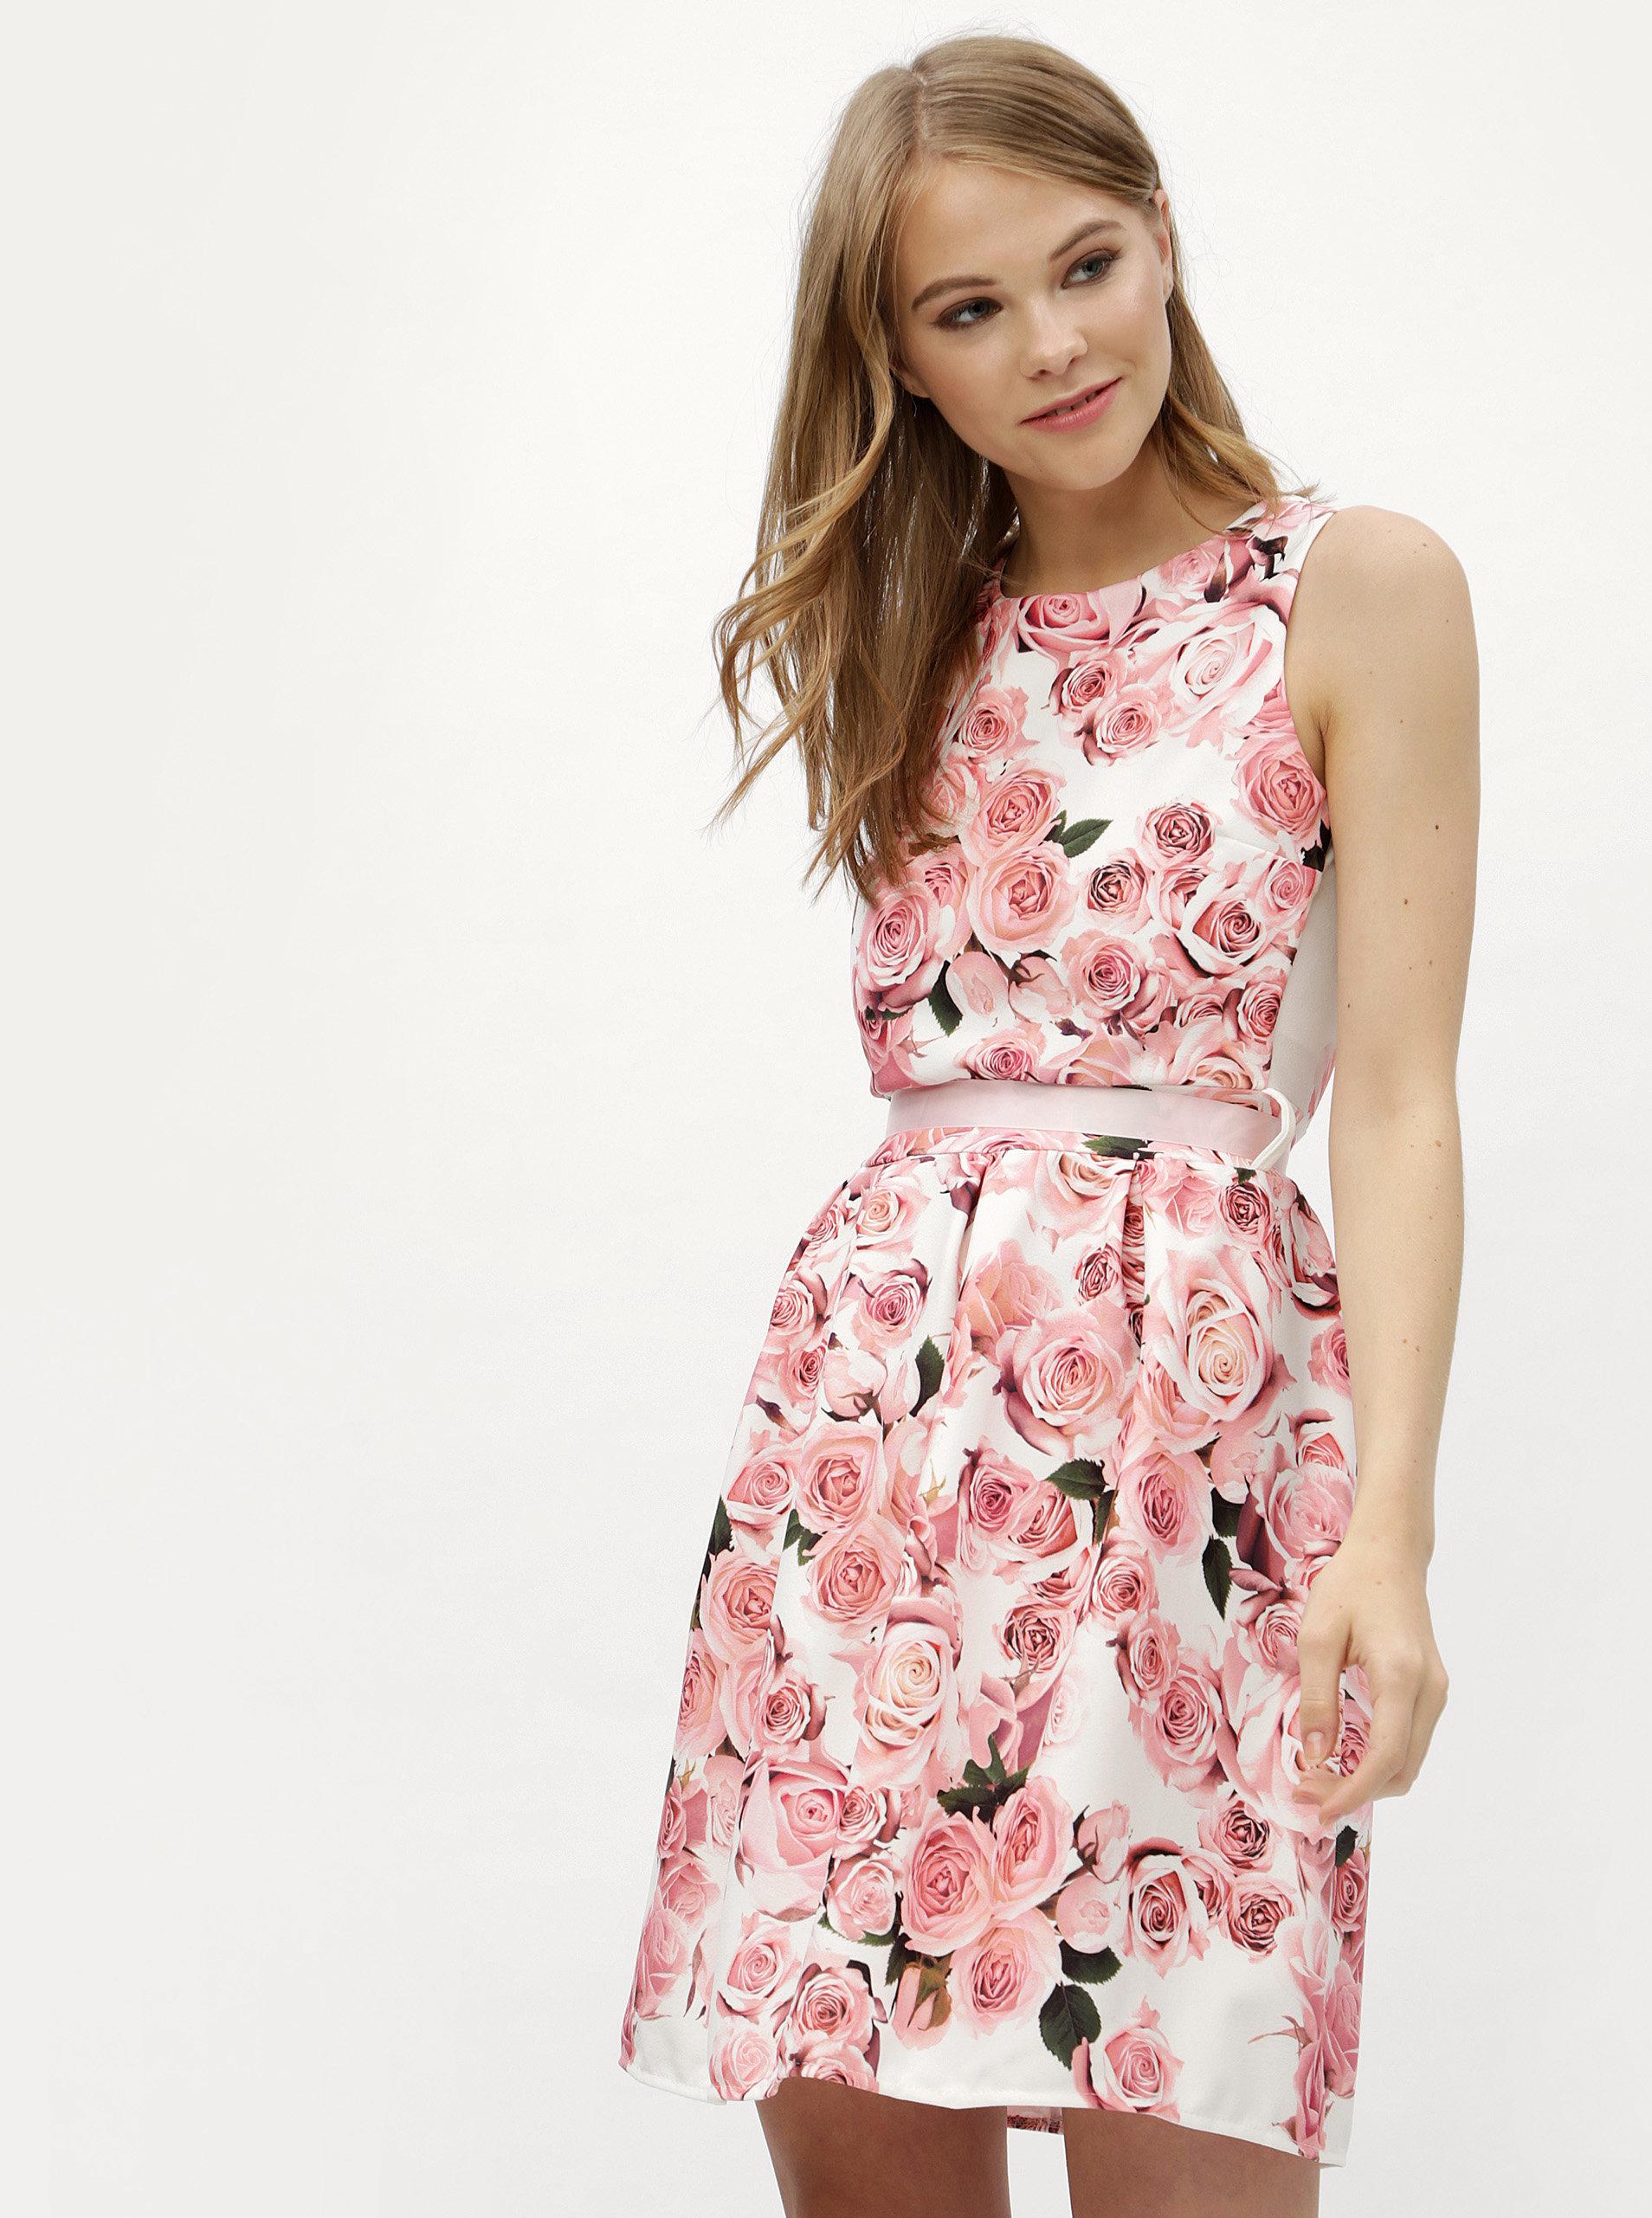 a69fda9999ca Bílo-růžové květované šaty se stuhou Haily´s Rosy ...